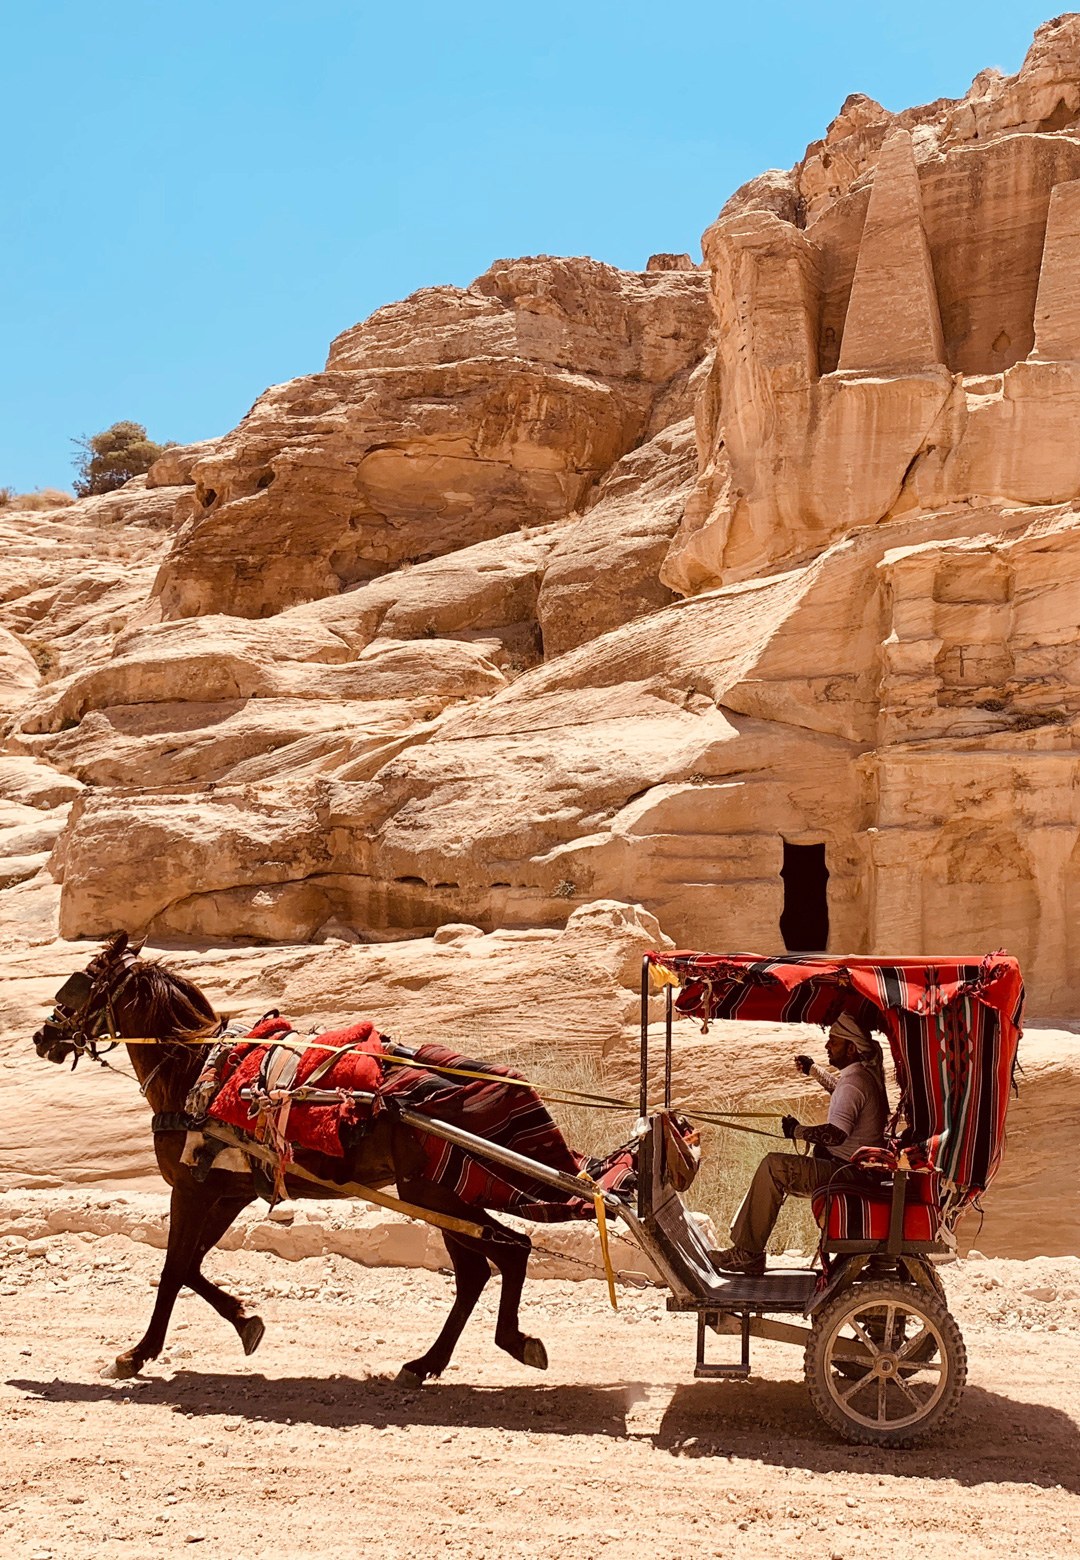 Petra is a famous archaeological site in Jordan's southwestern desert | Petra, Jordan | Sandeep and Tania Khosla| STIRworld